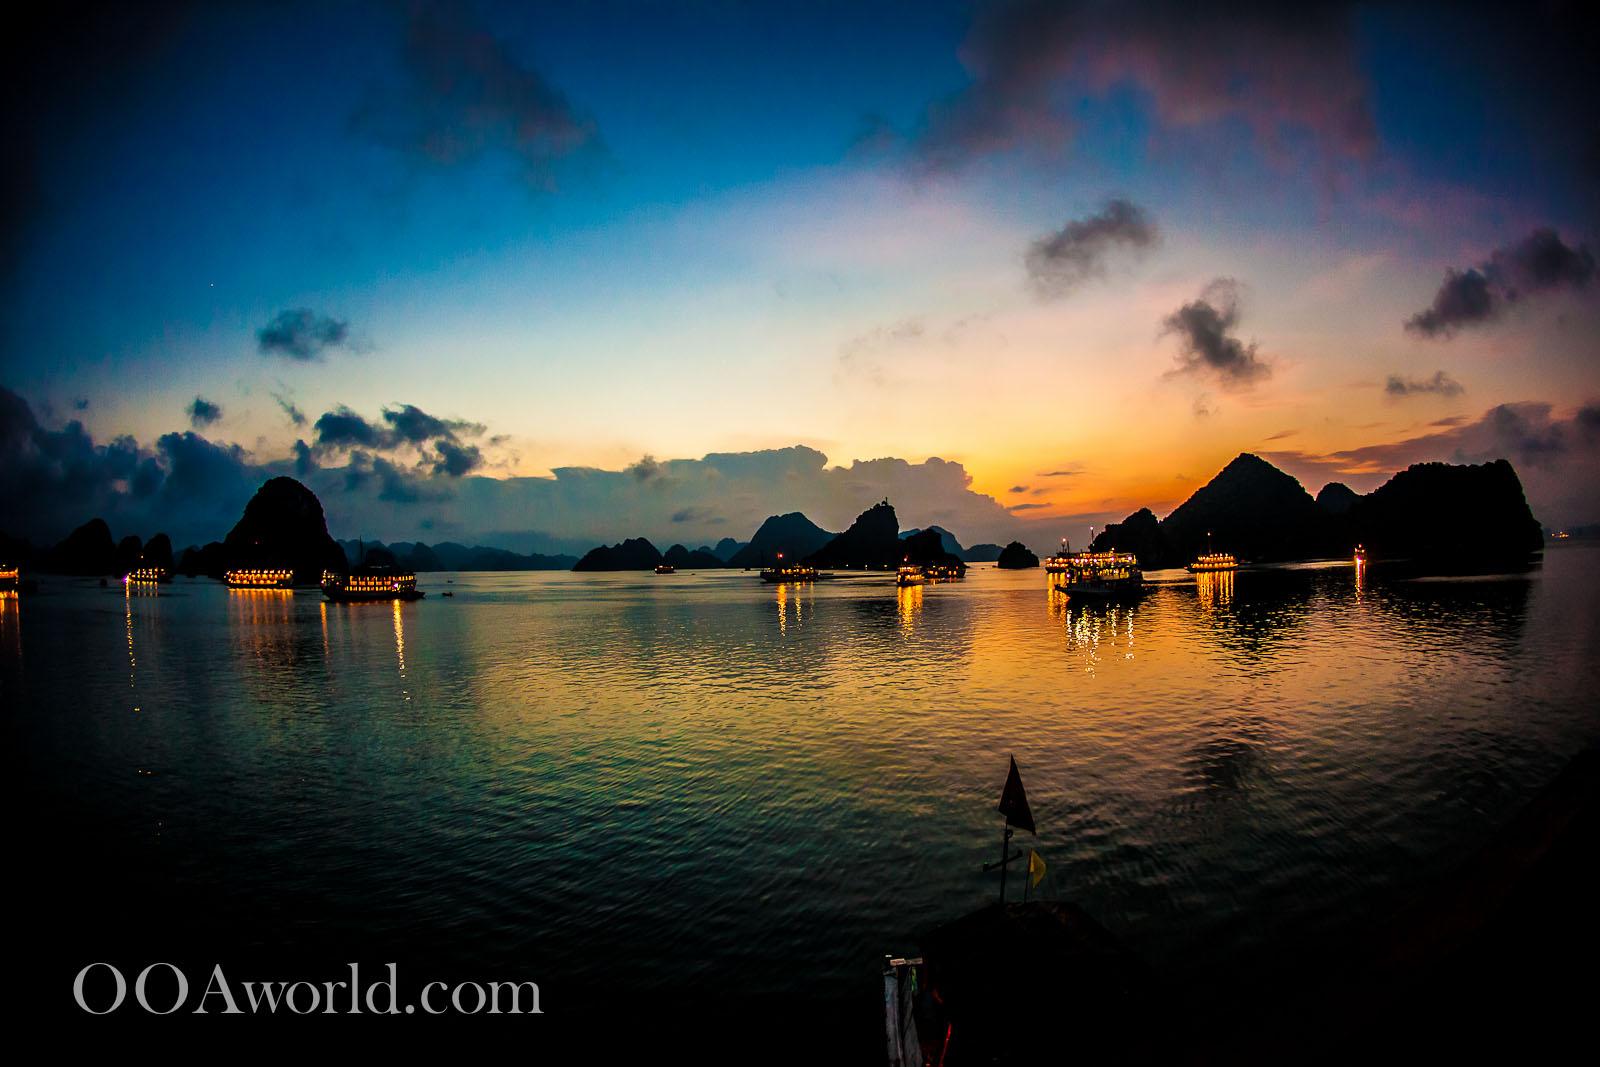 Halong Bay Vietnam Photos Sunset Ooaworld